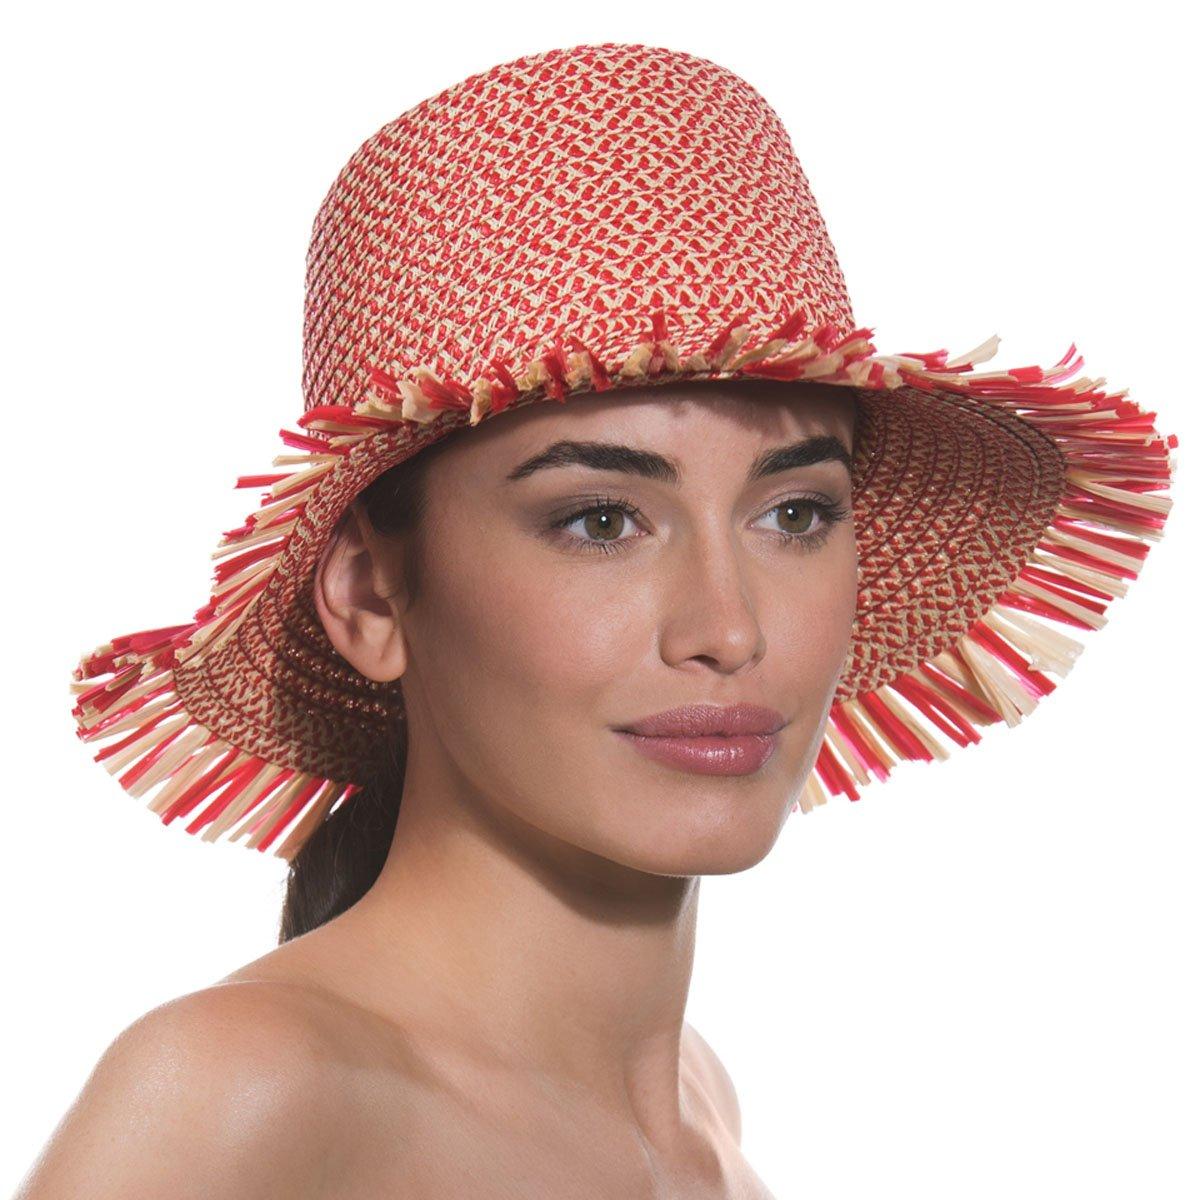 Eric Javits Luxury Fashion Designer Women's Headwear Hat - Tiki Bucket - Red Mix by Eric Javits